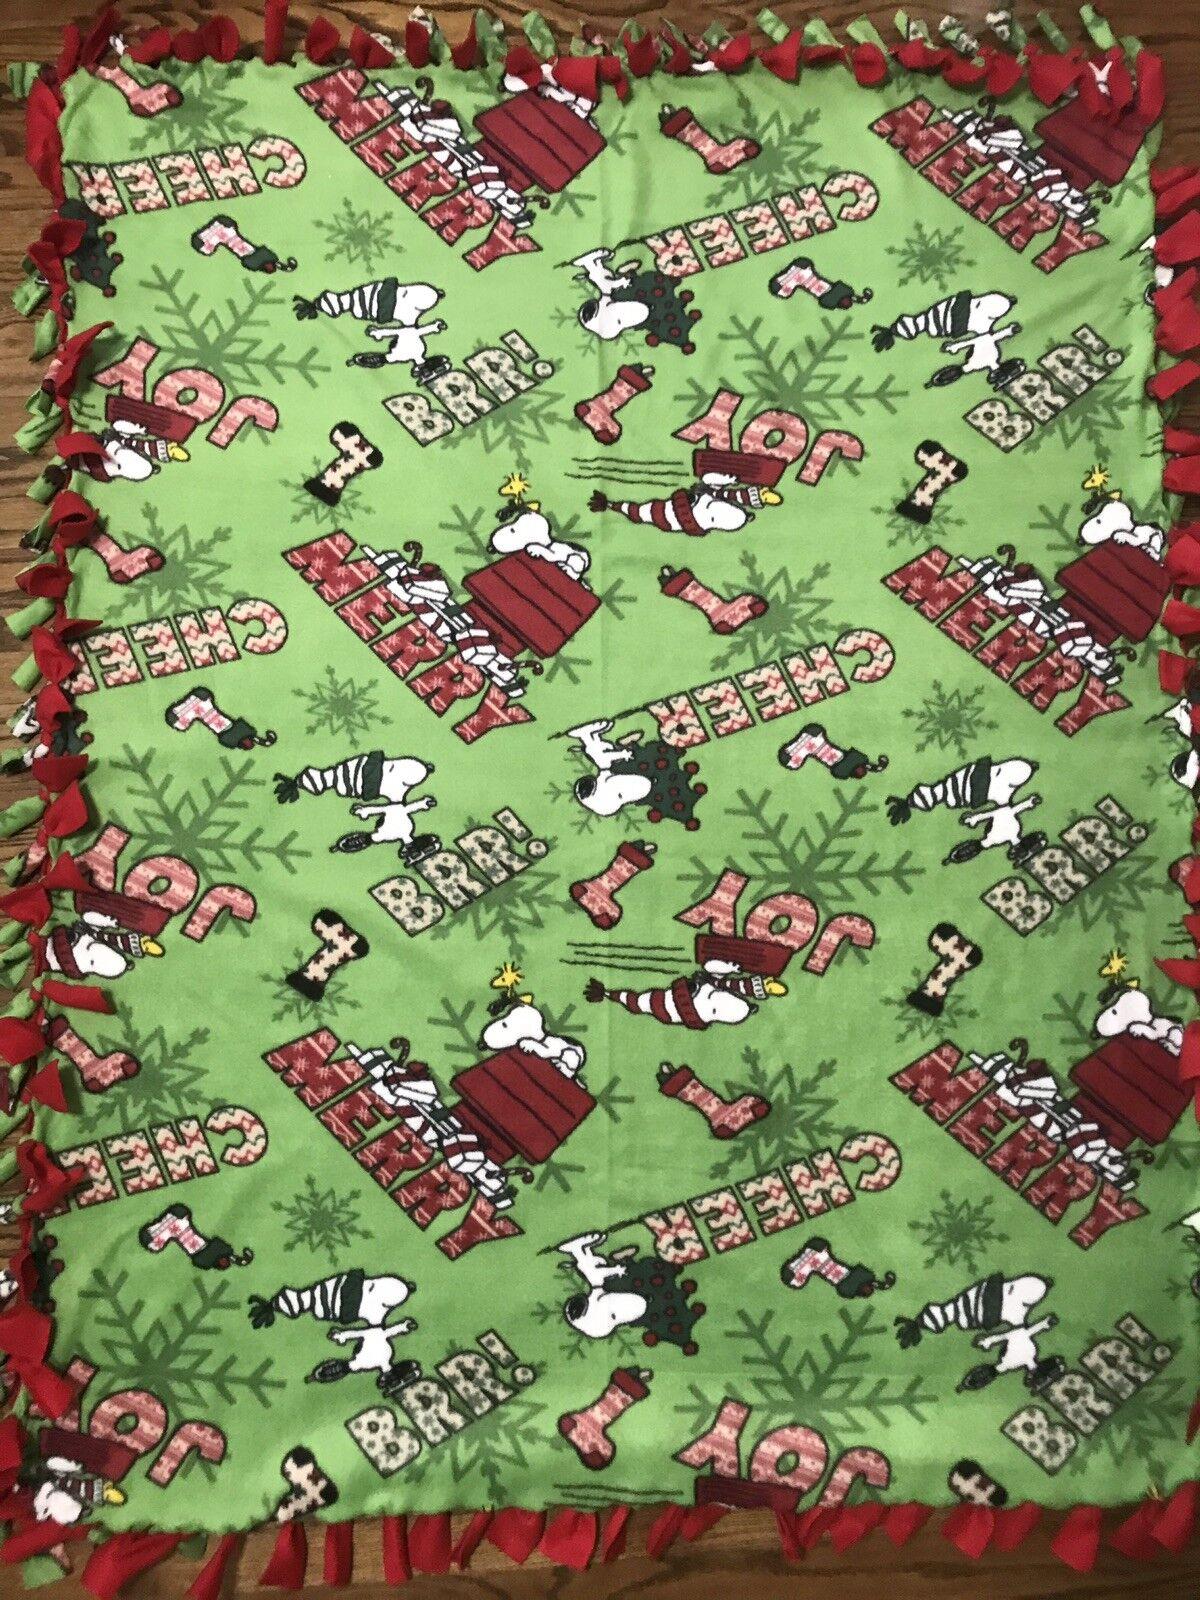 Christmas Peanuts Snoopy Fleece Tie Blanket